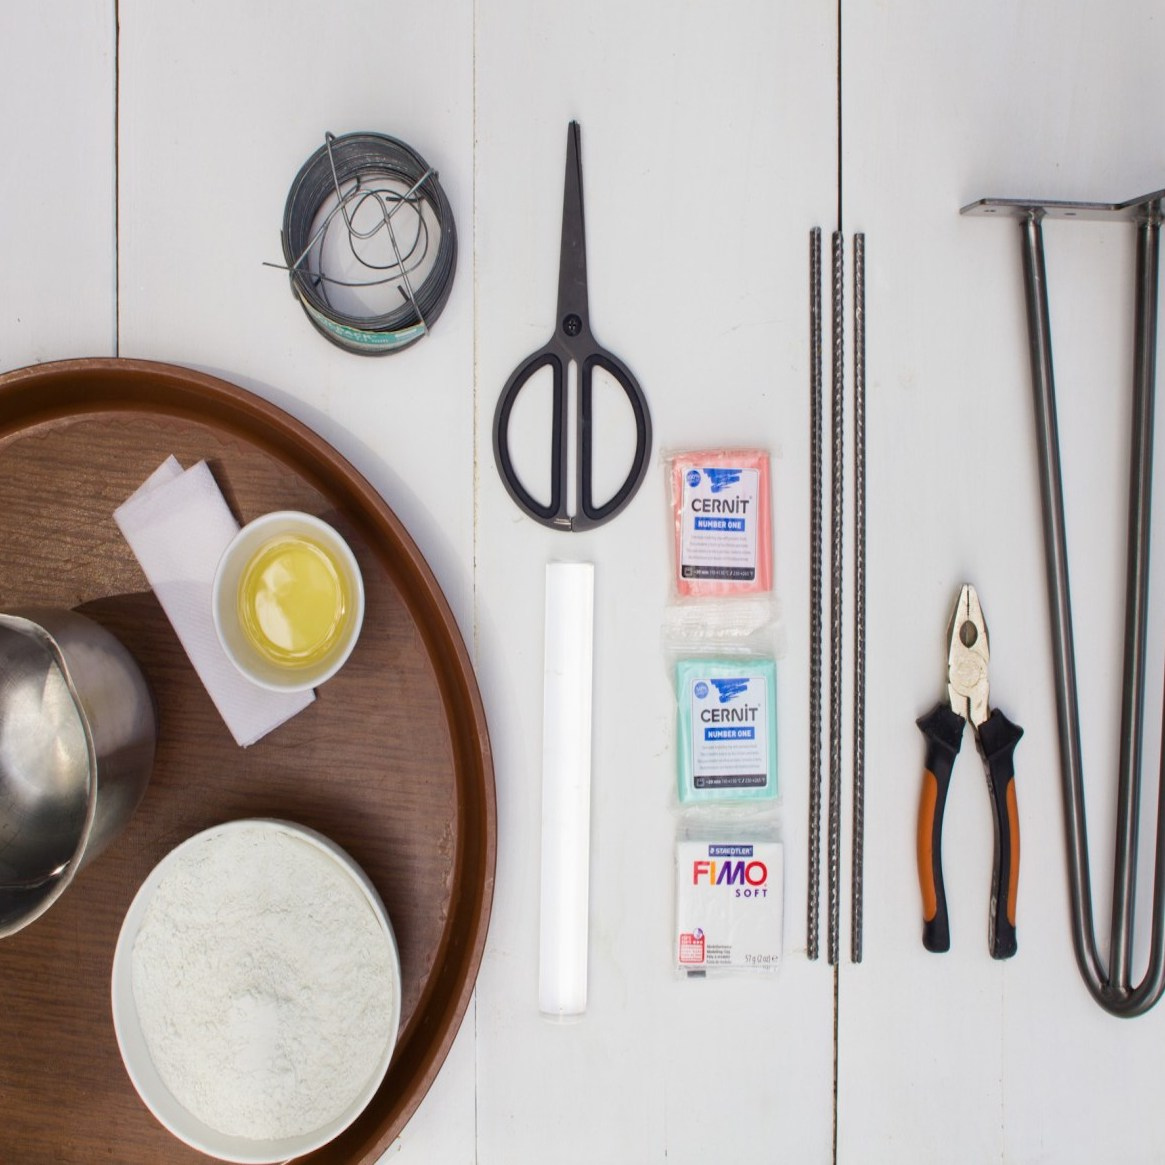 diy tutoriel fabrication table ustensiles bricolage